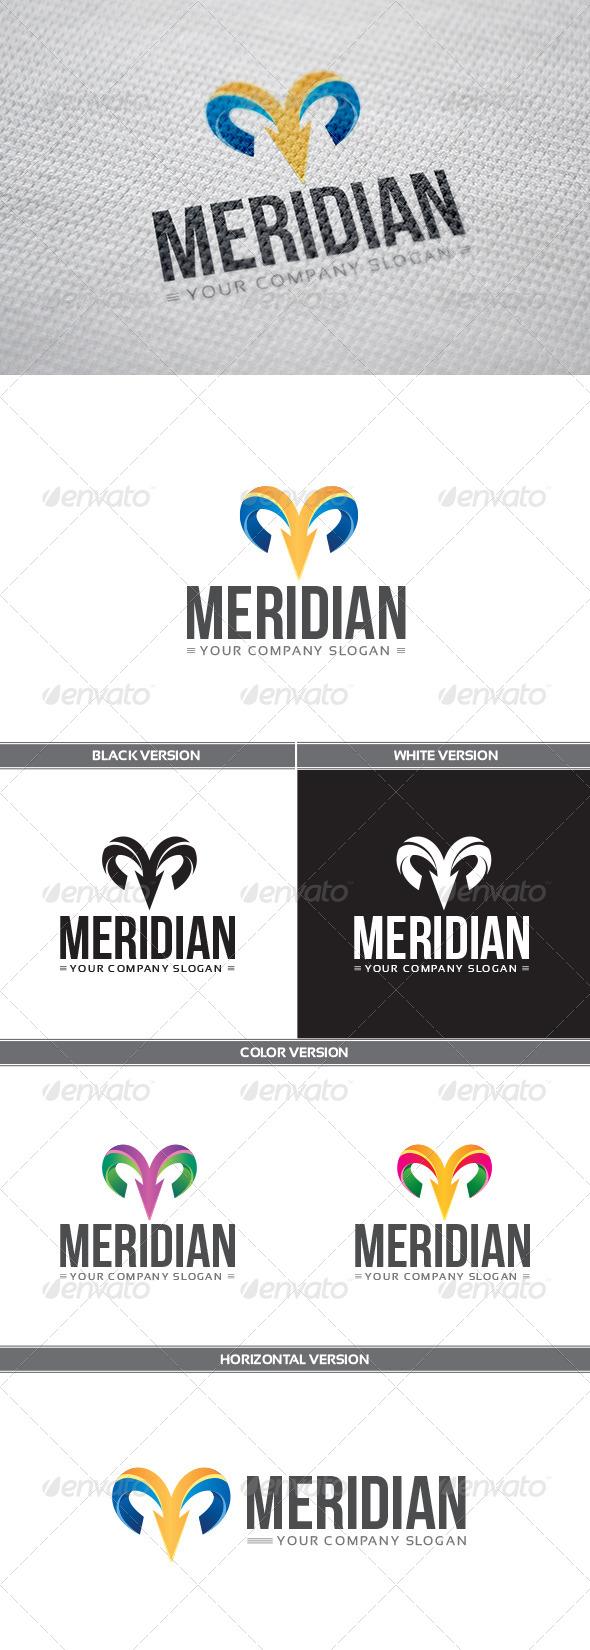 GraphicRiver Meridian Logo 8142693